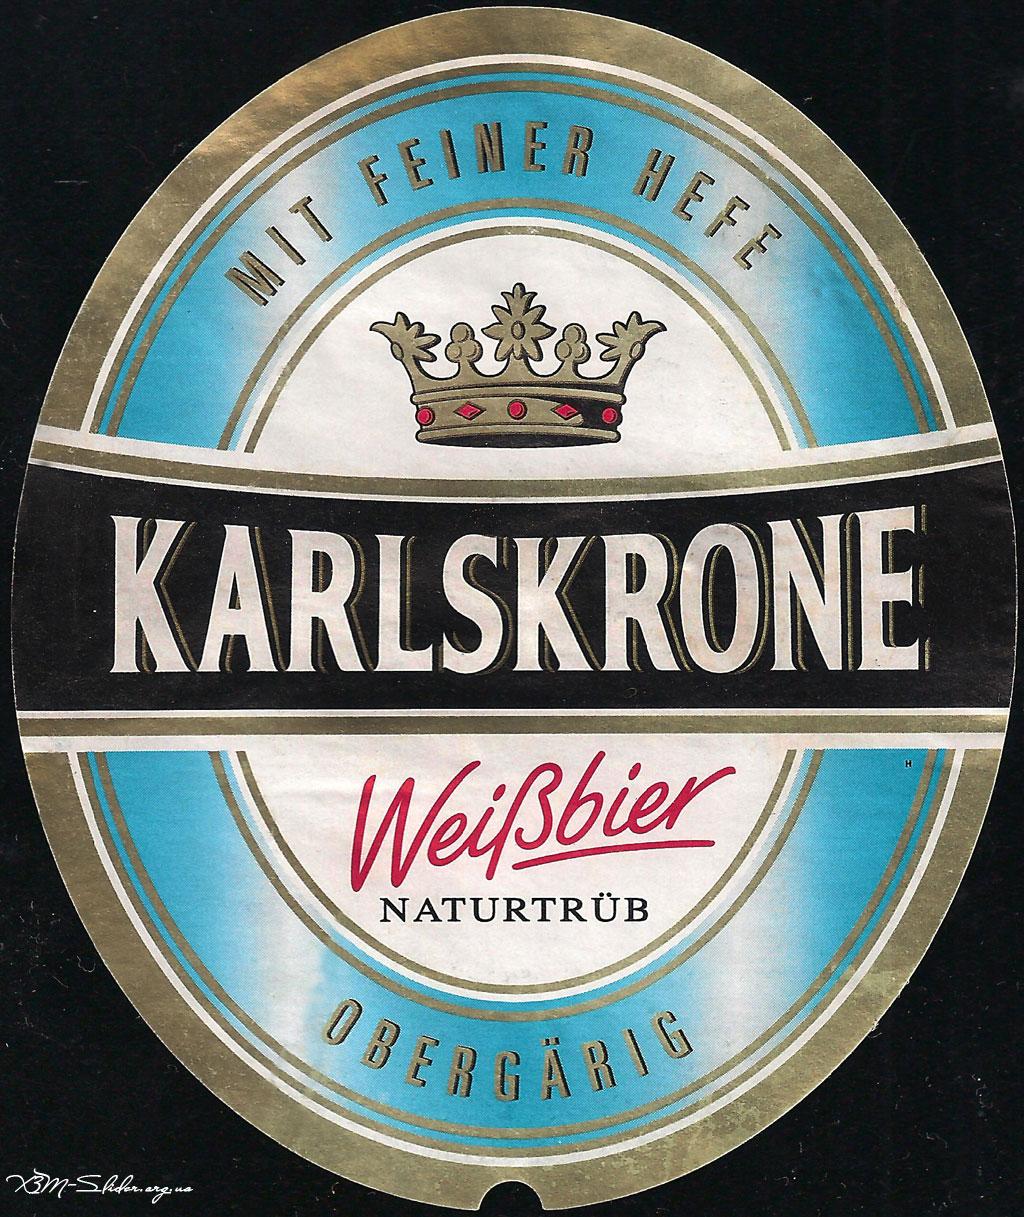 Karlskrone - WeiBbier